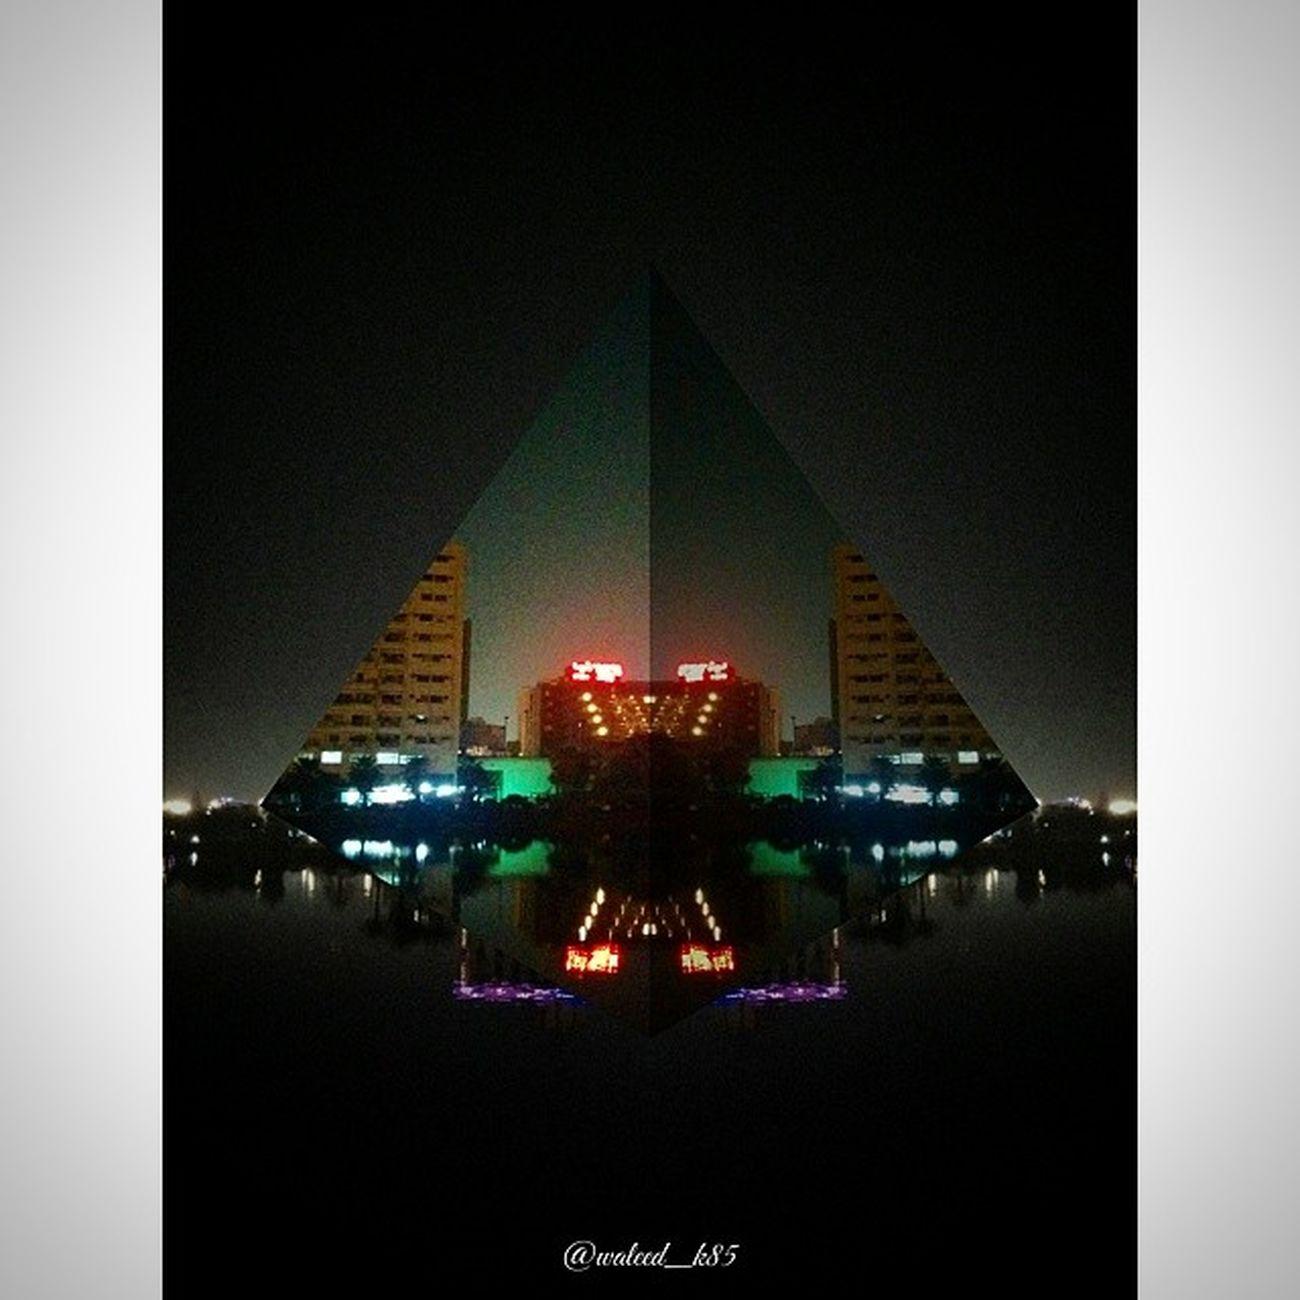 Edited by D3lta App . Lake at Historicdistrict in HistoricJeddah AlBalad. jeddah saudi_arabia SaudiArabia. Taken by my LG Nexus5. جدة السعودية بحيرة البلد جدة_التاريخية